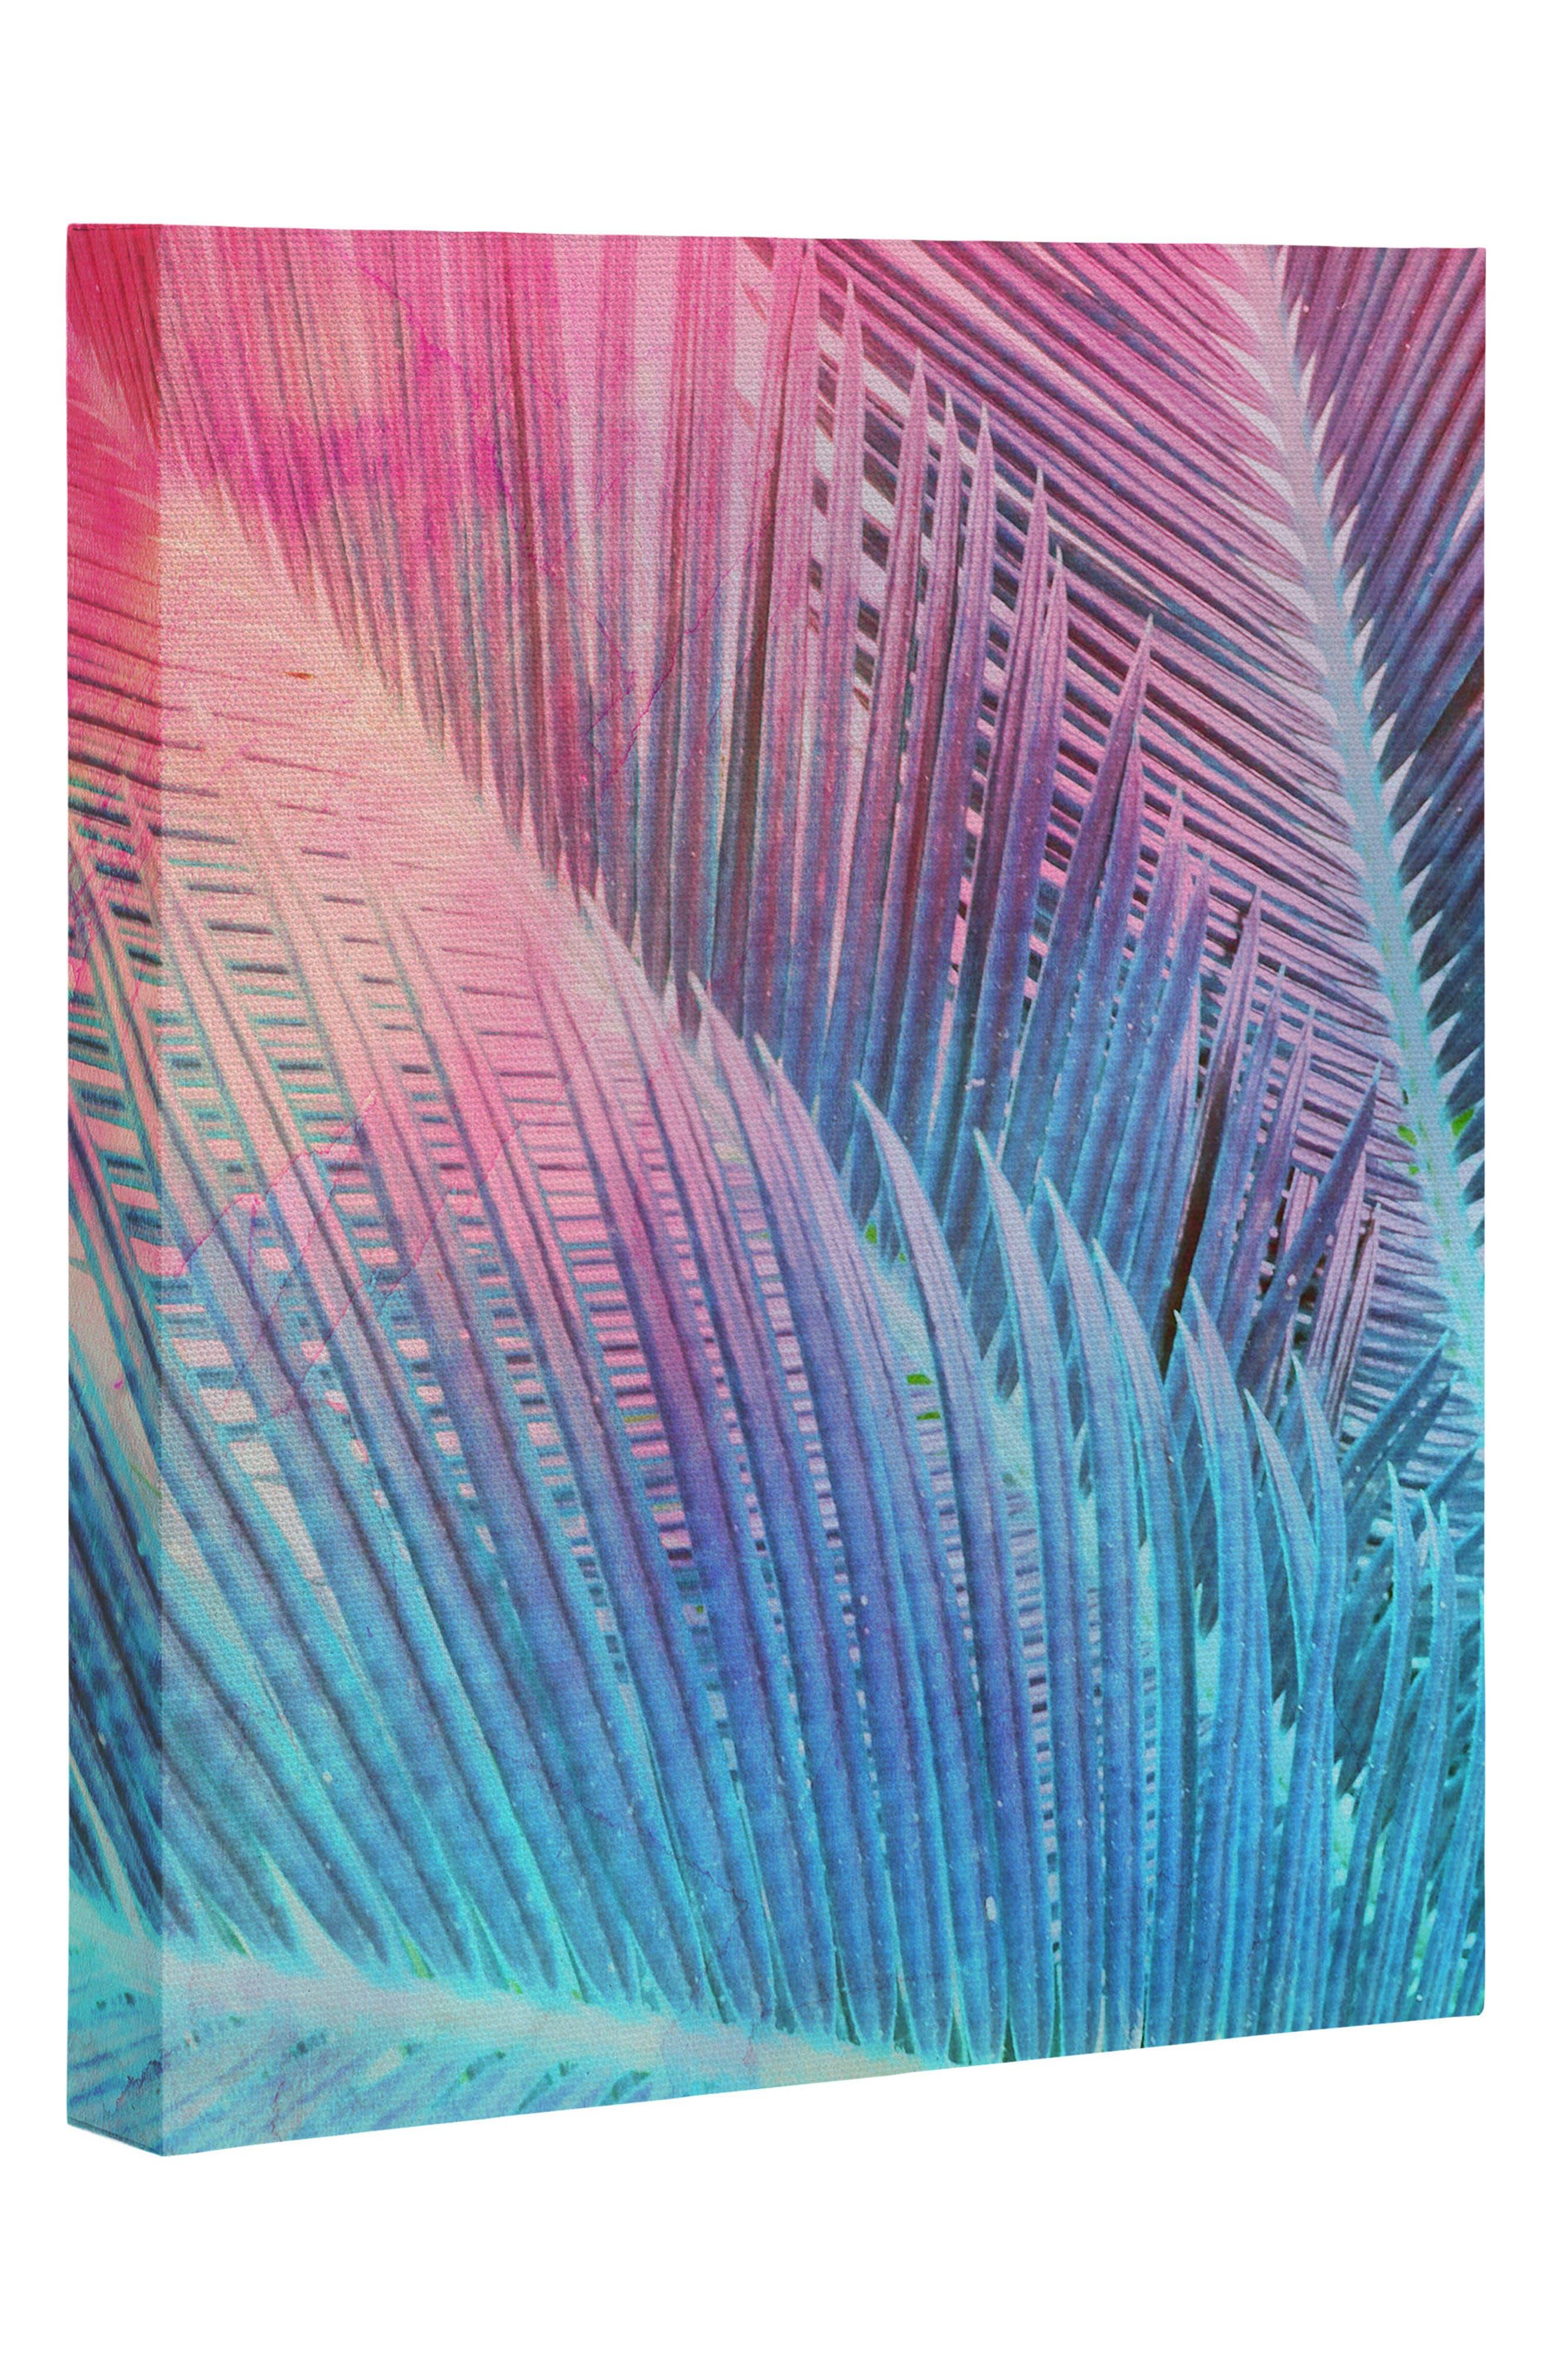 Main Image - Deny Designs Palm 1 Canvas Wall Art